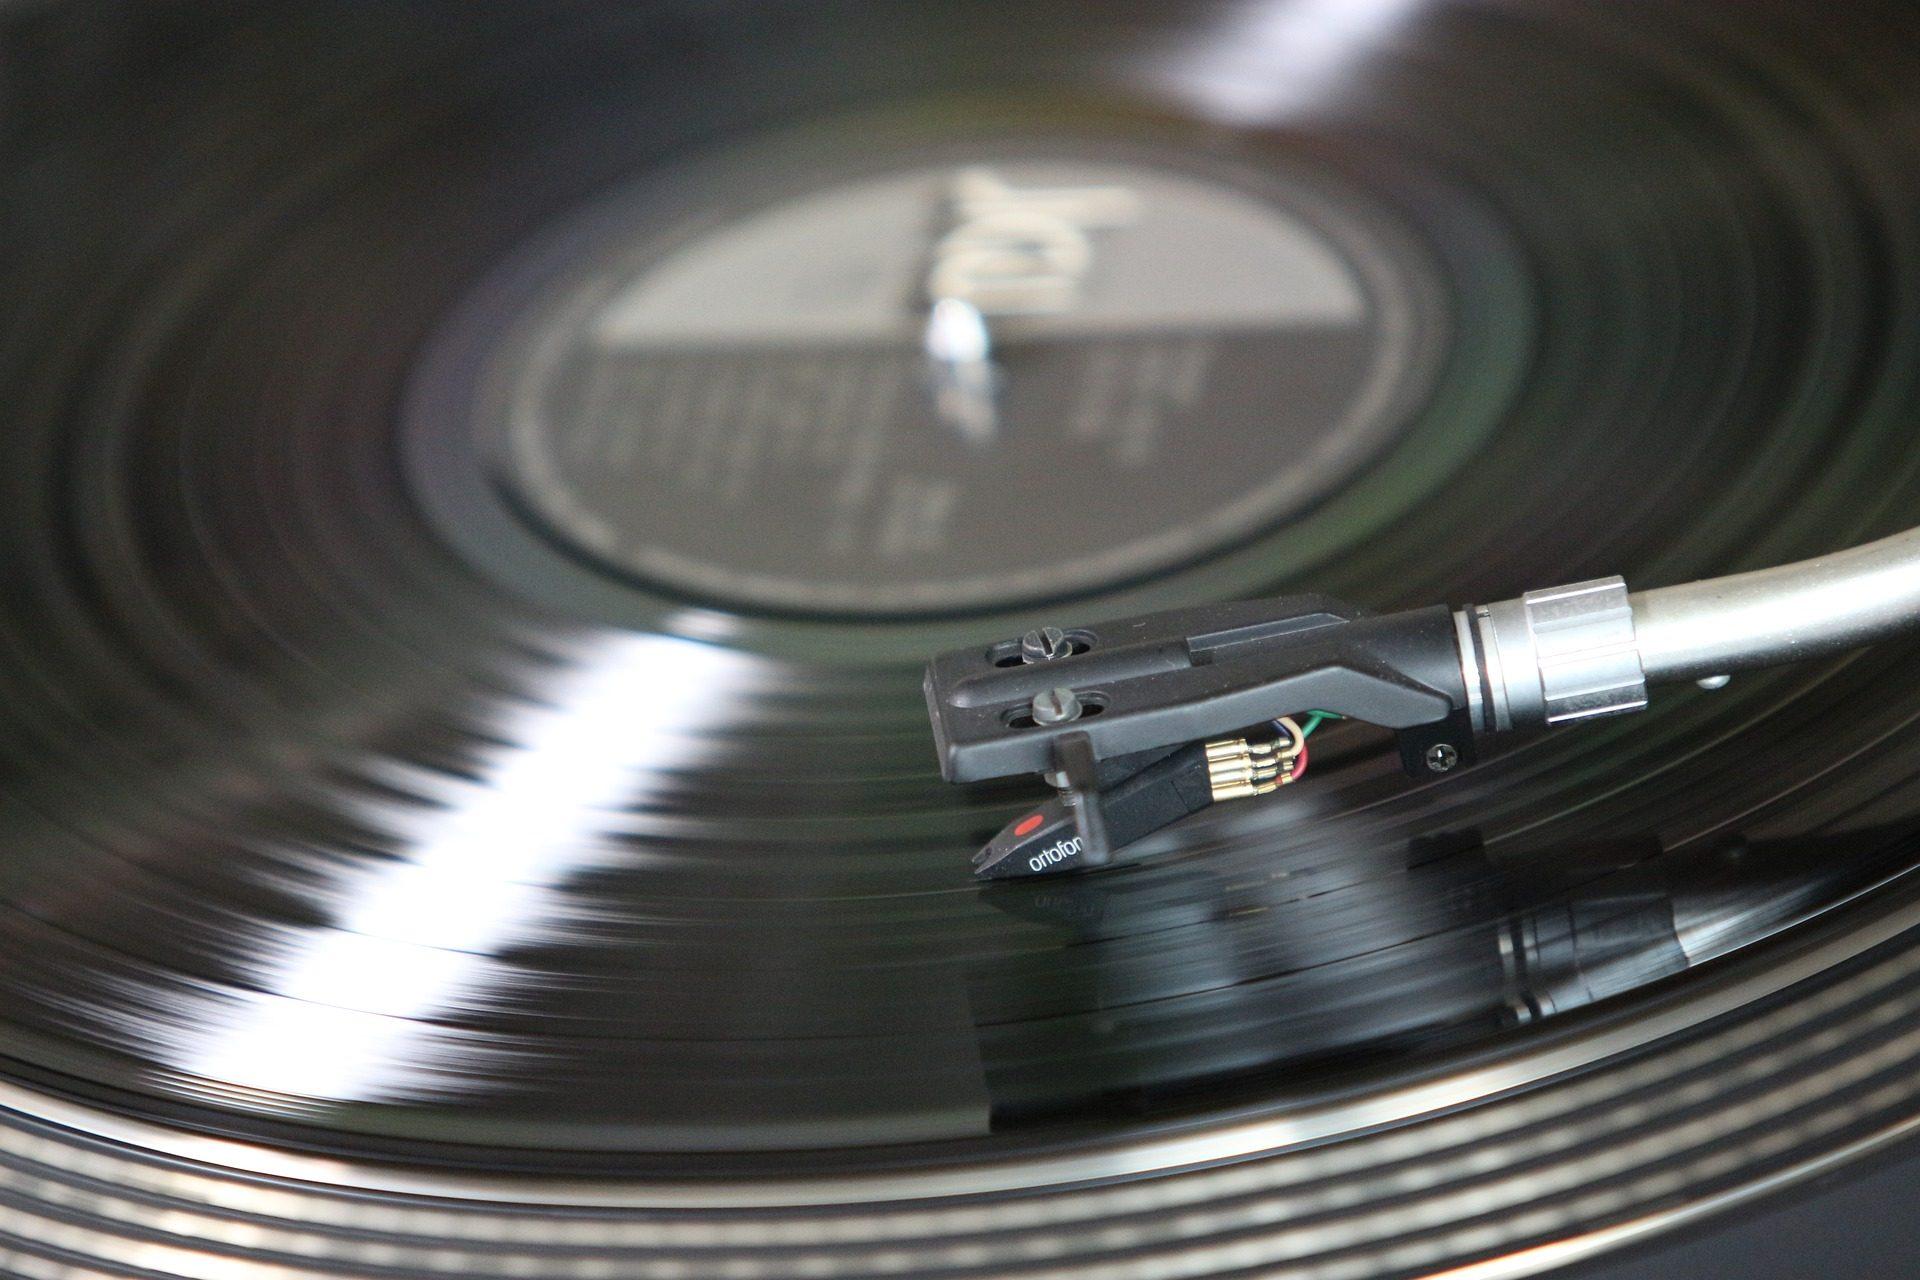 disco, vinilo, tocadiscos, aguja, vintage - Fondos de Pantalla HD - professor-falken.com